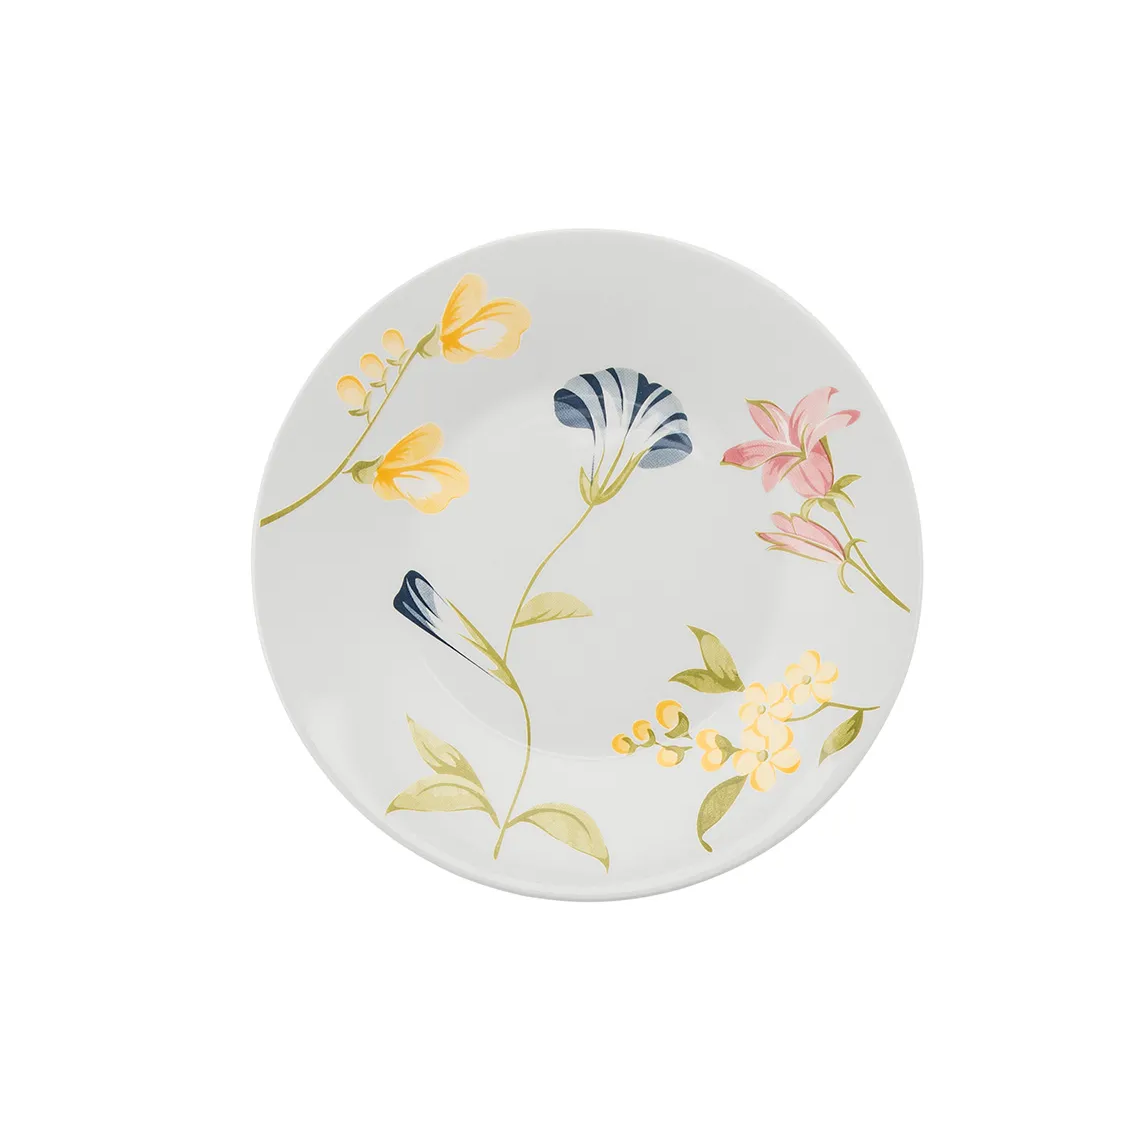 Prato de Sobremesa Redondo em Ceramica May Branco 19cm - Biona